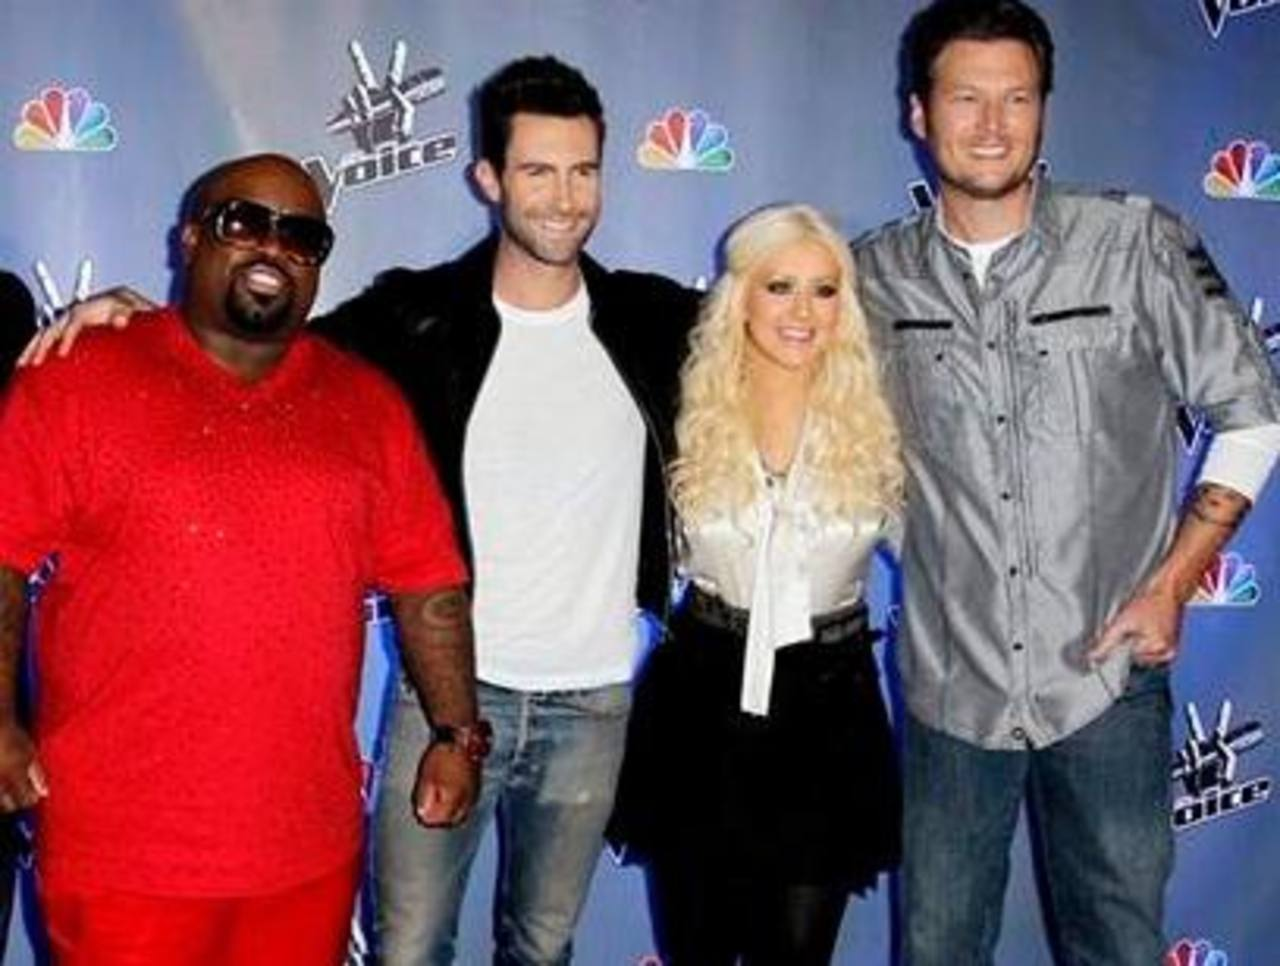 "De izquierda a derecha, Cee Lo Green, Adam Levine, Christina Aguilera y Blake Shelton, coaches de la competencia de canto ""The Voice"". Foto/ AP"